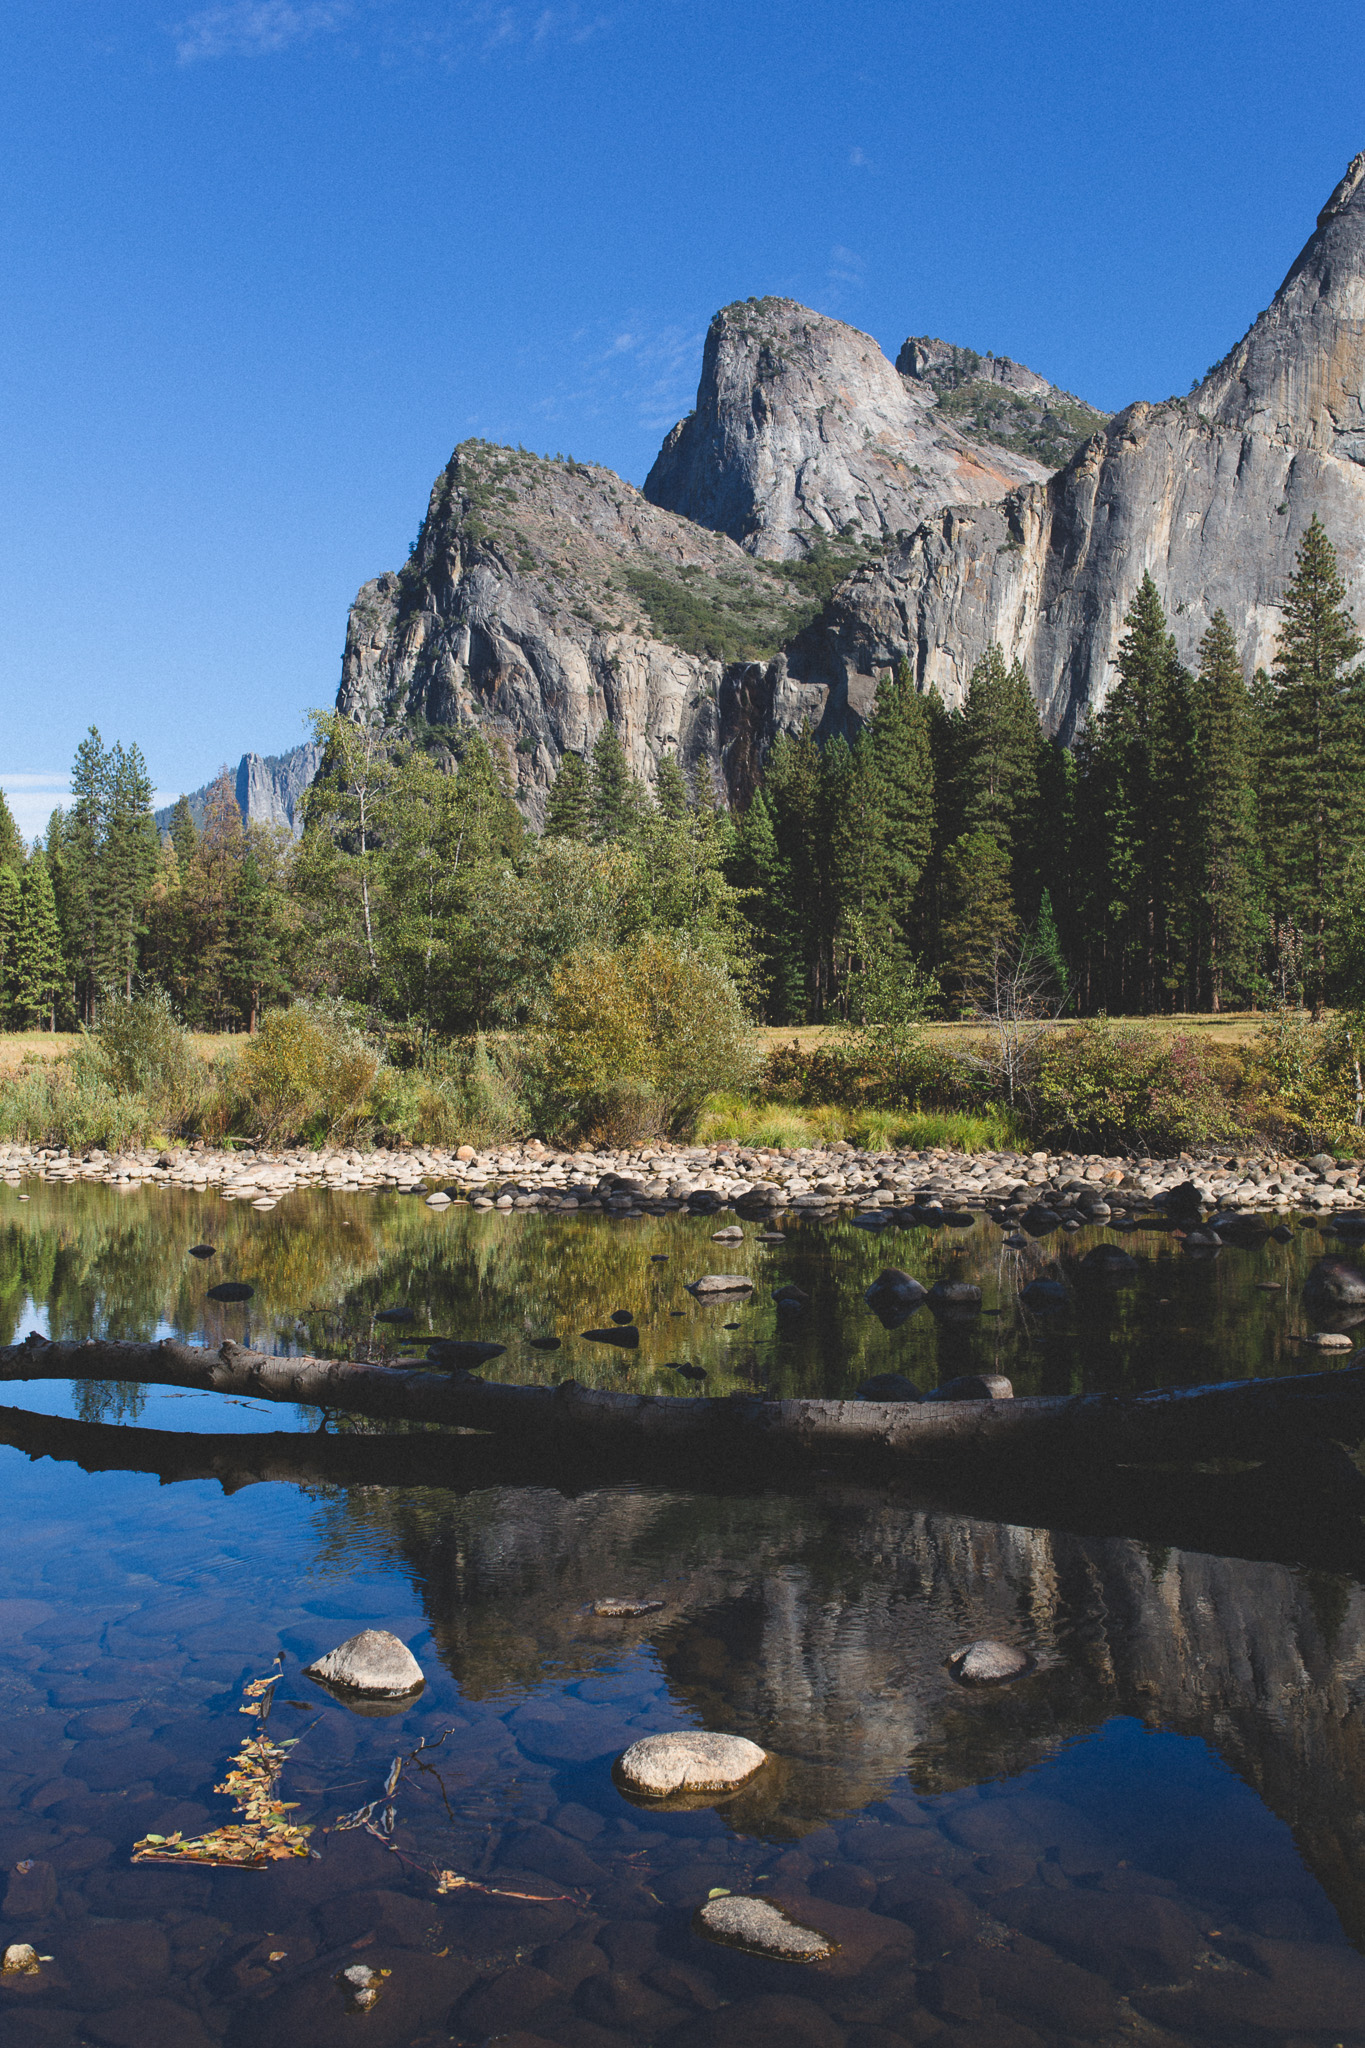 Reflection in Yosemite